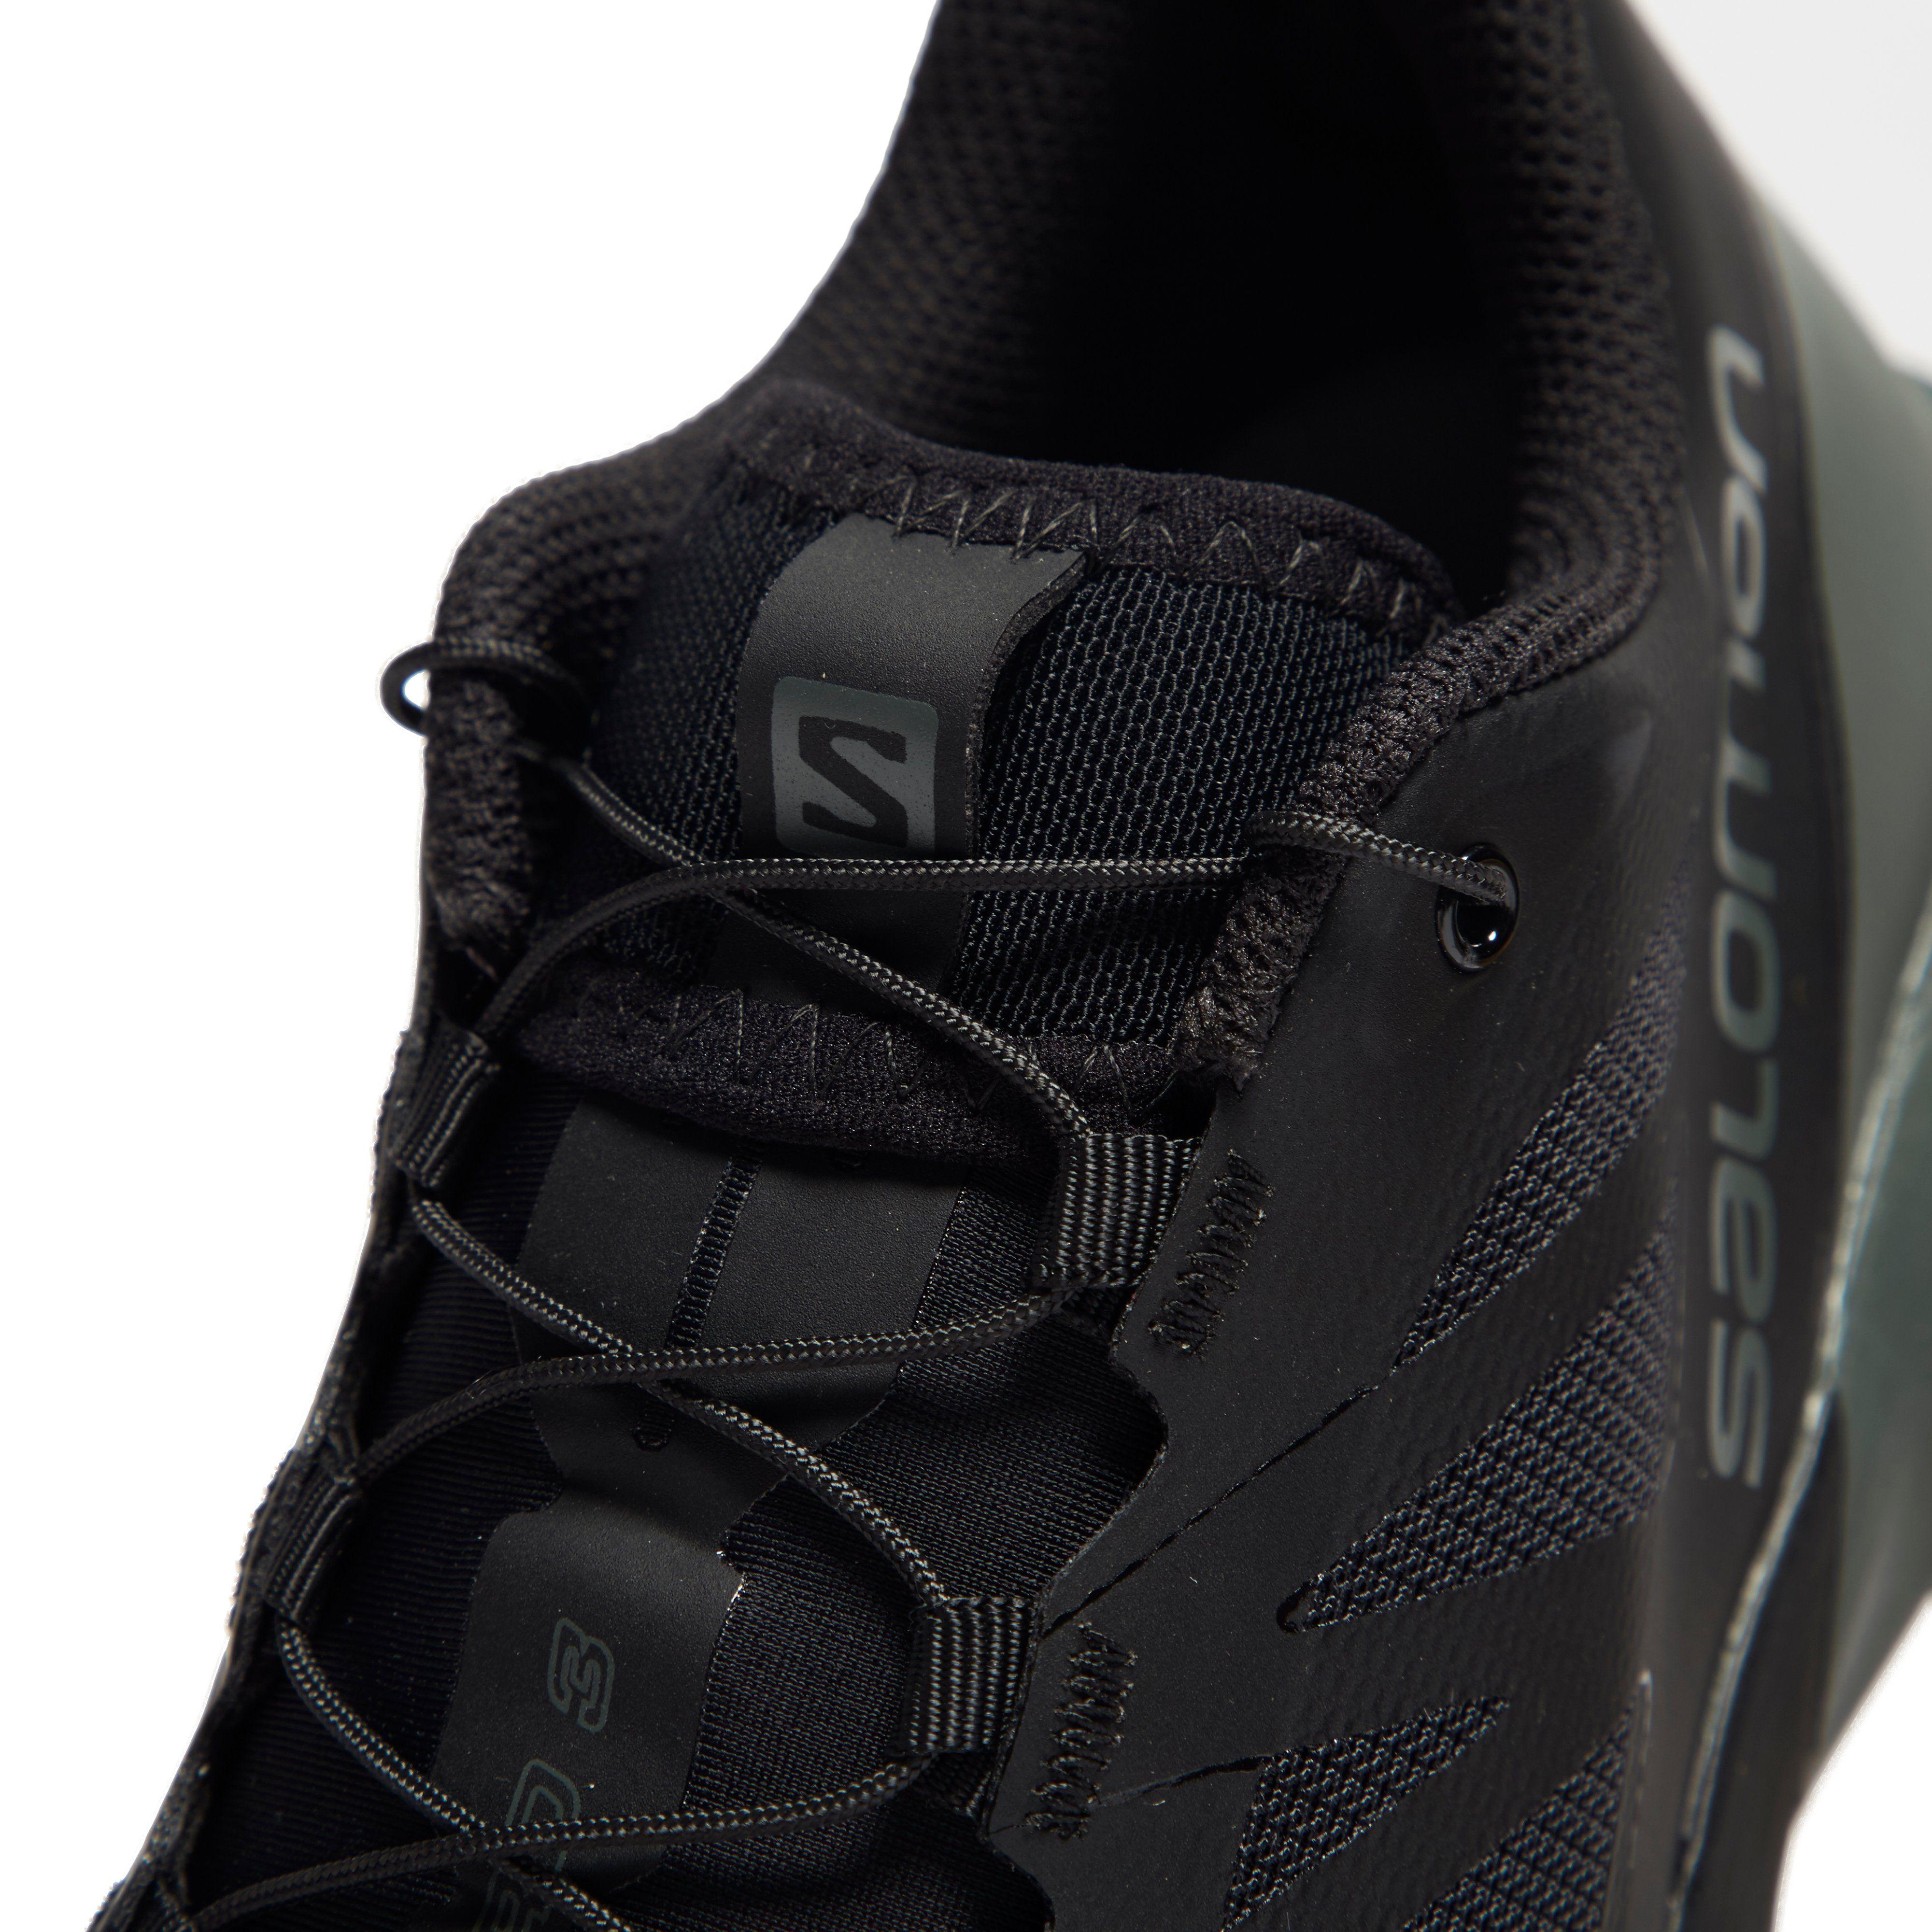 Salomon Sense Pro 3 Men's Trail Running Shoes